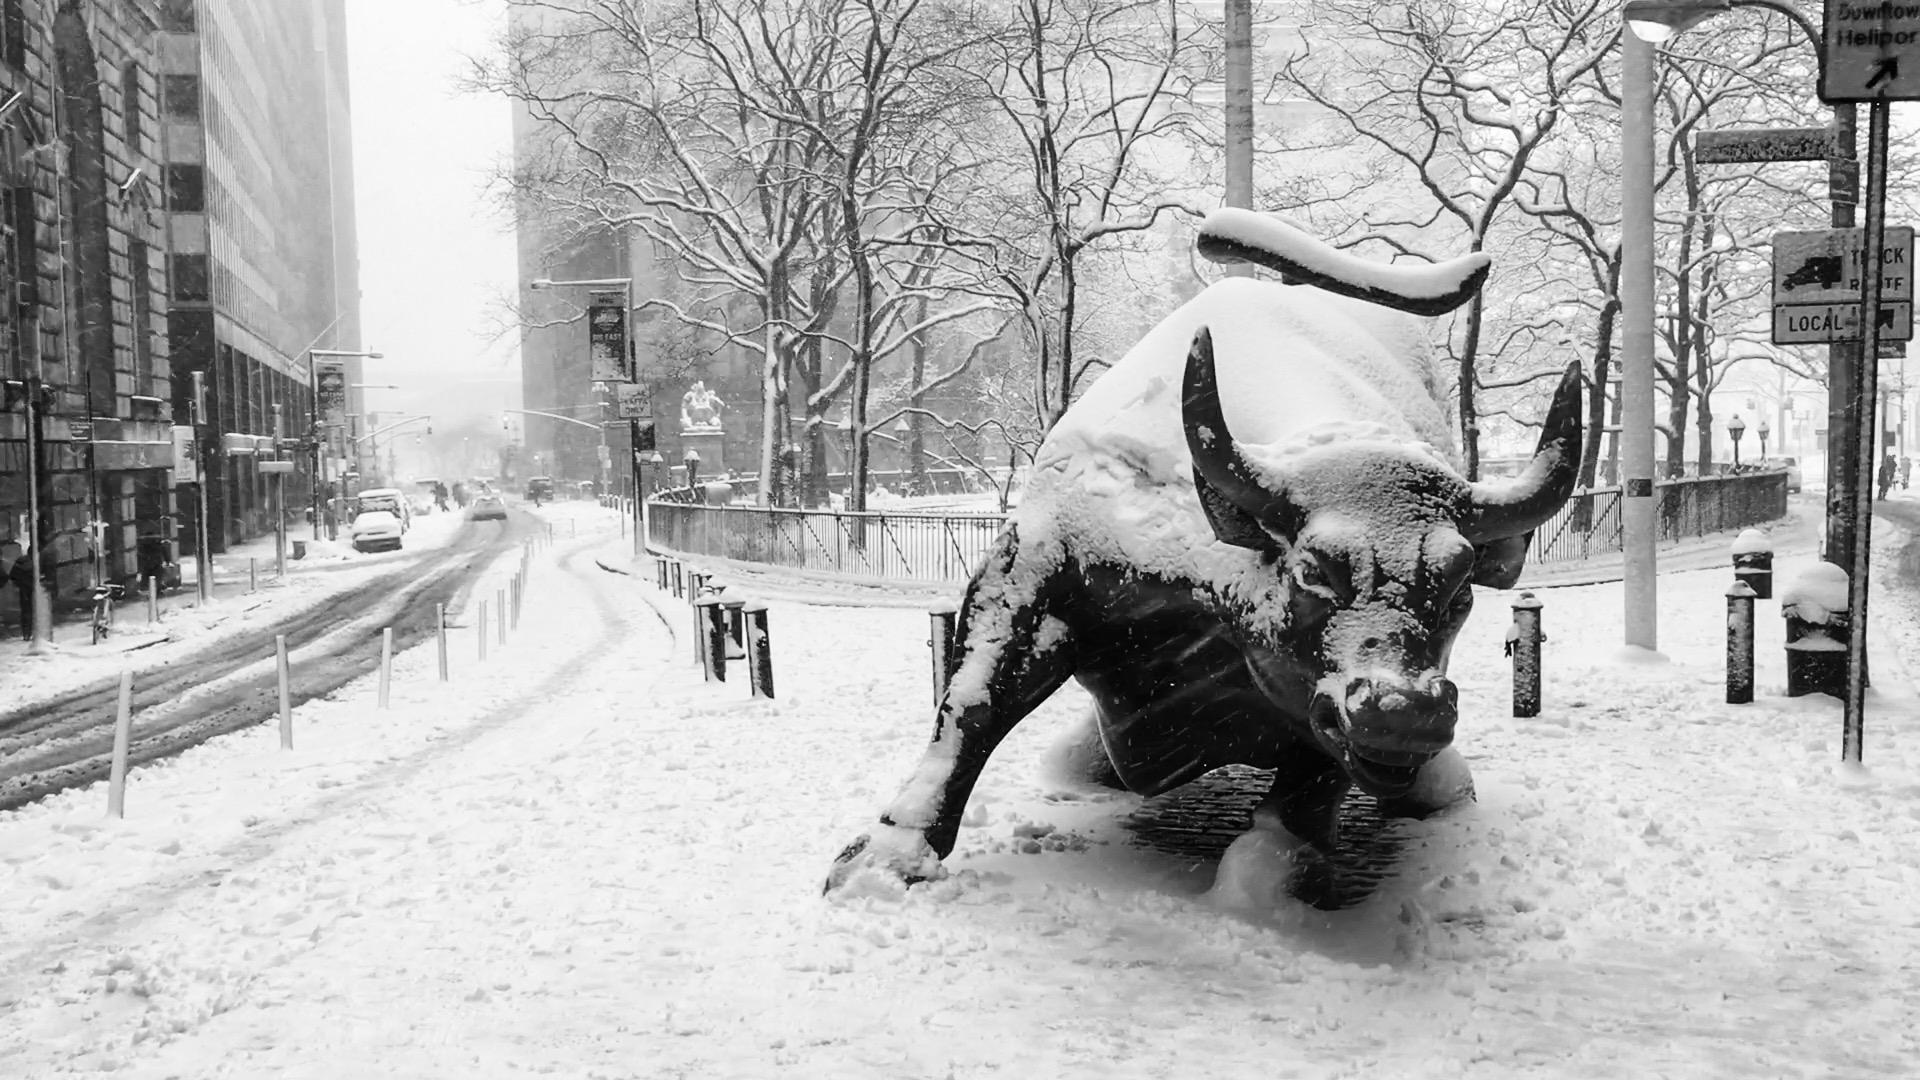 Bull on Bowling Green. Photo by Alberto Zamora.